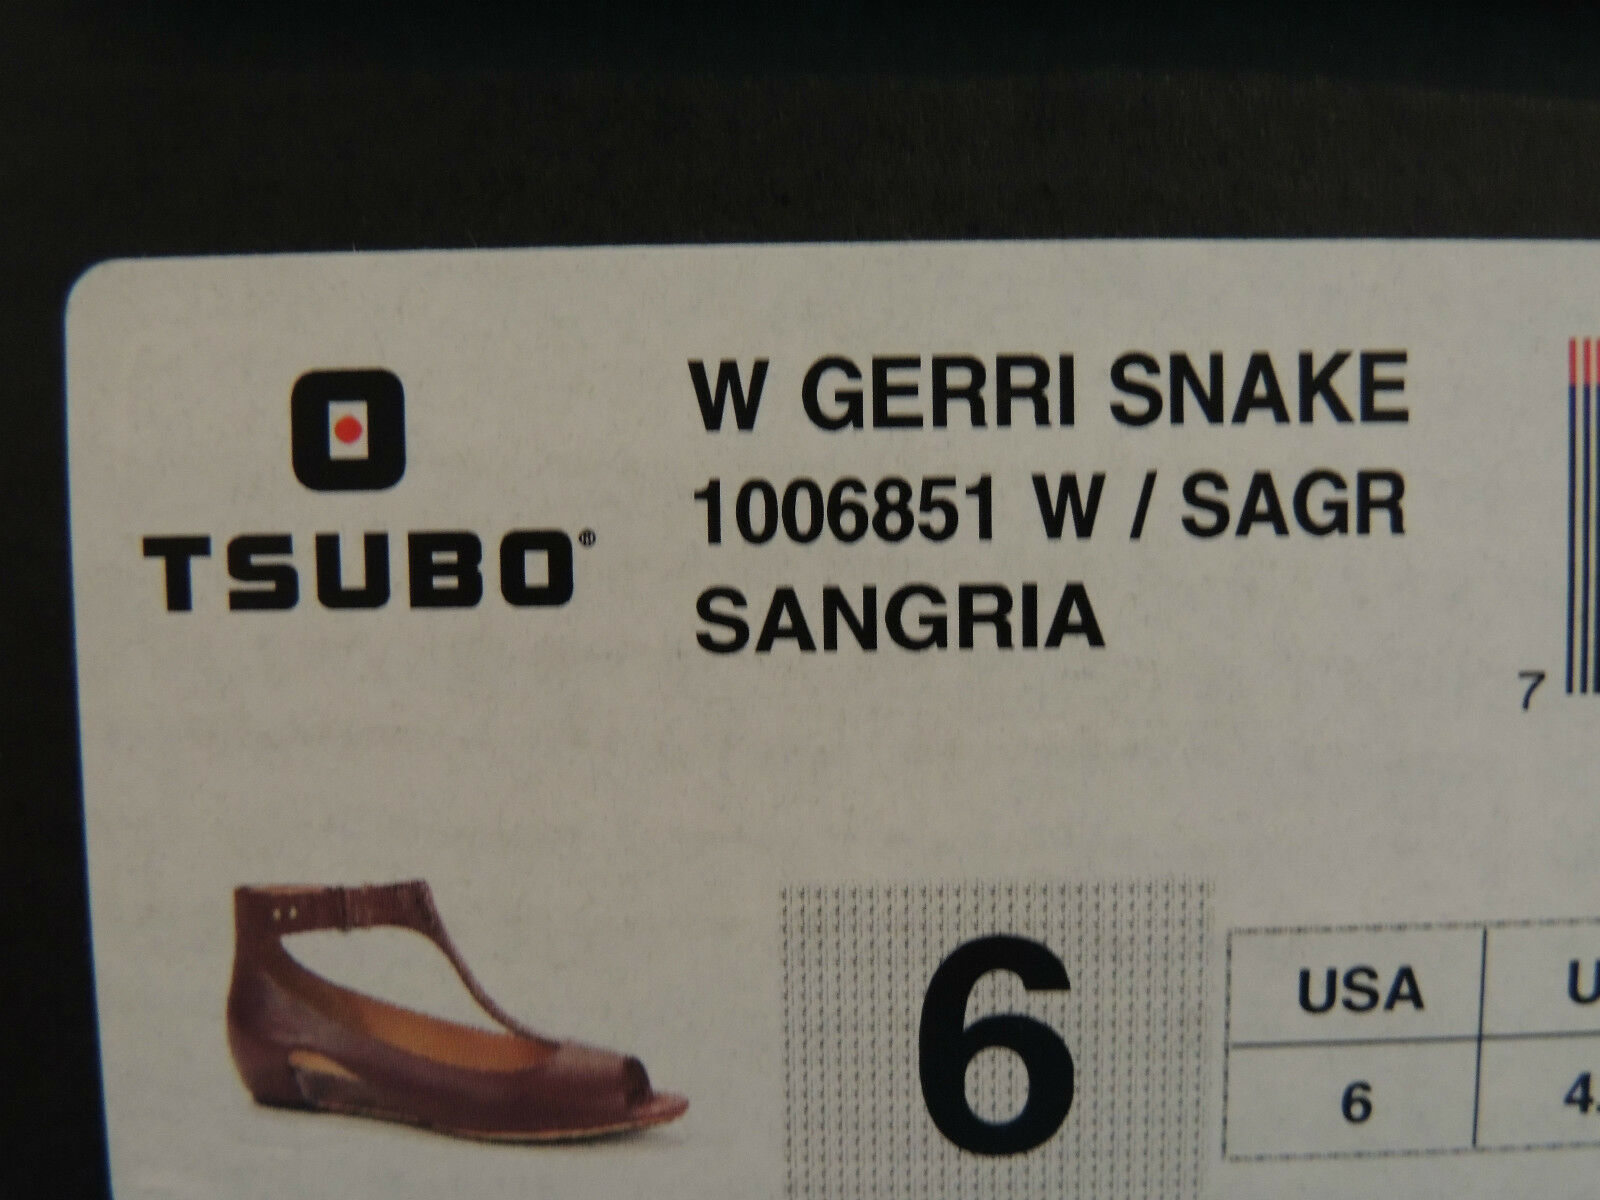 TSUBO SANGRIA GERRI SNAKE T- US STRAP WEDGE HEELS/ SANDALS, US T- 6/ EUR 37 NIB e9c7e1